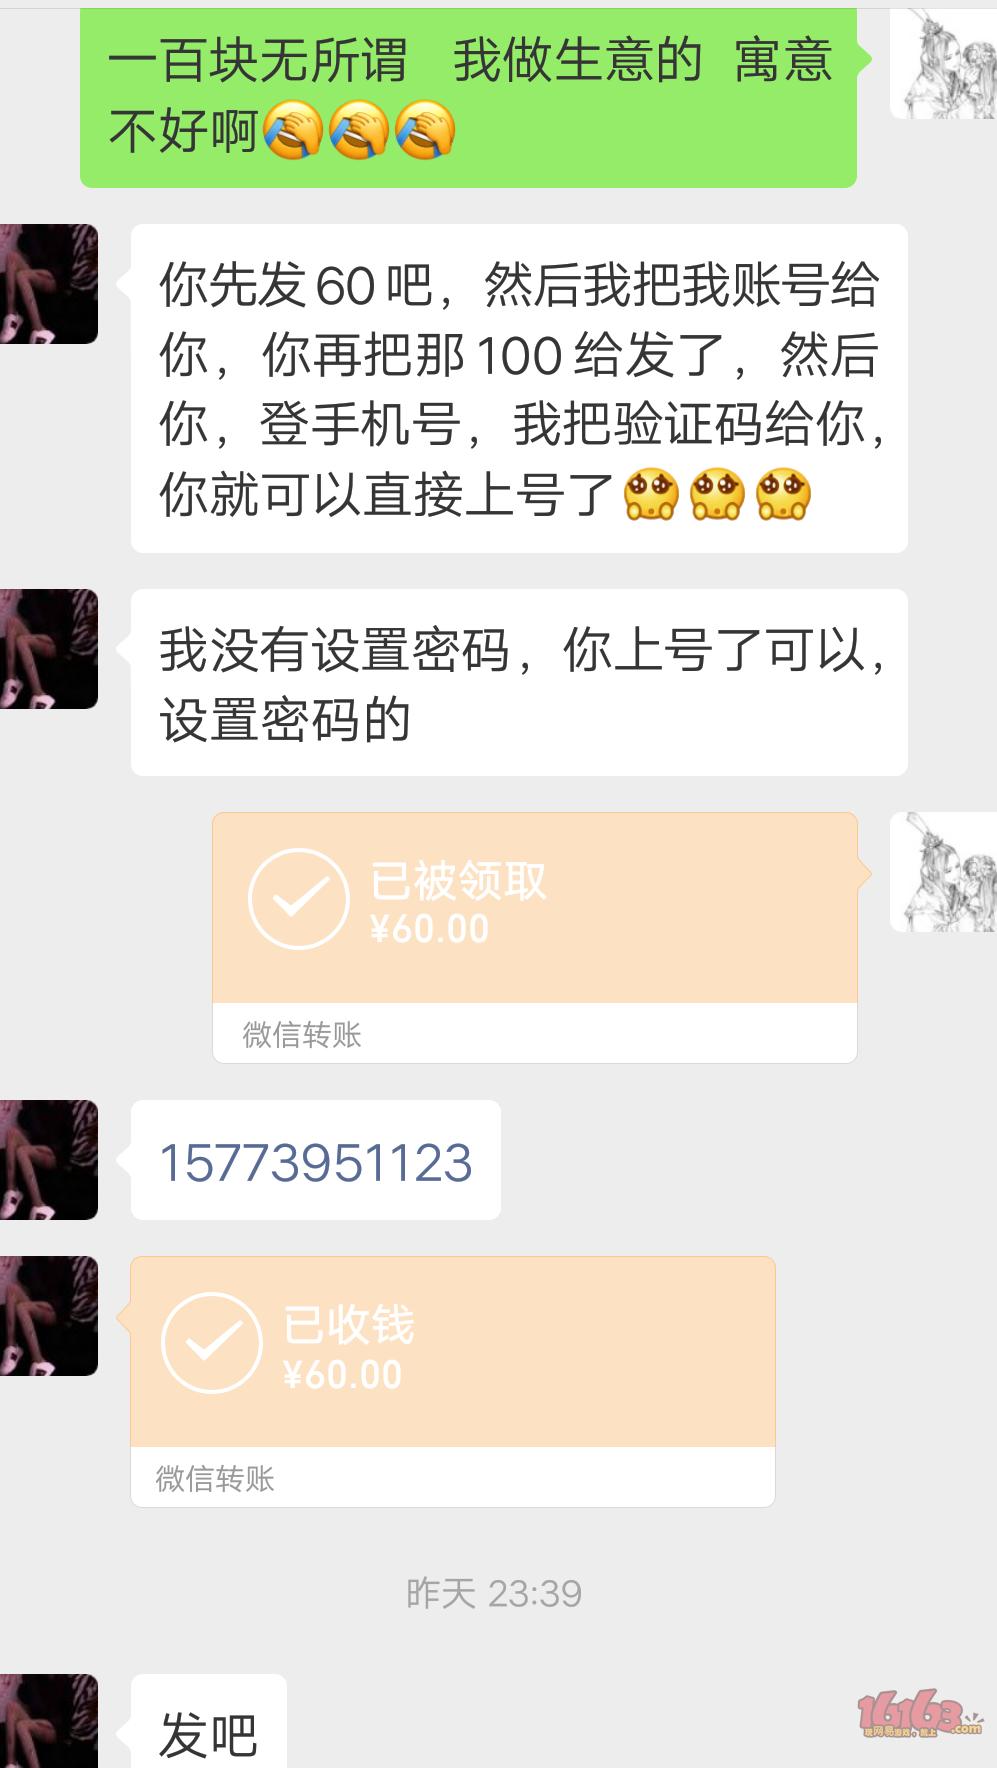 Screenshot_2019_0205_001746.png